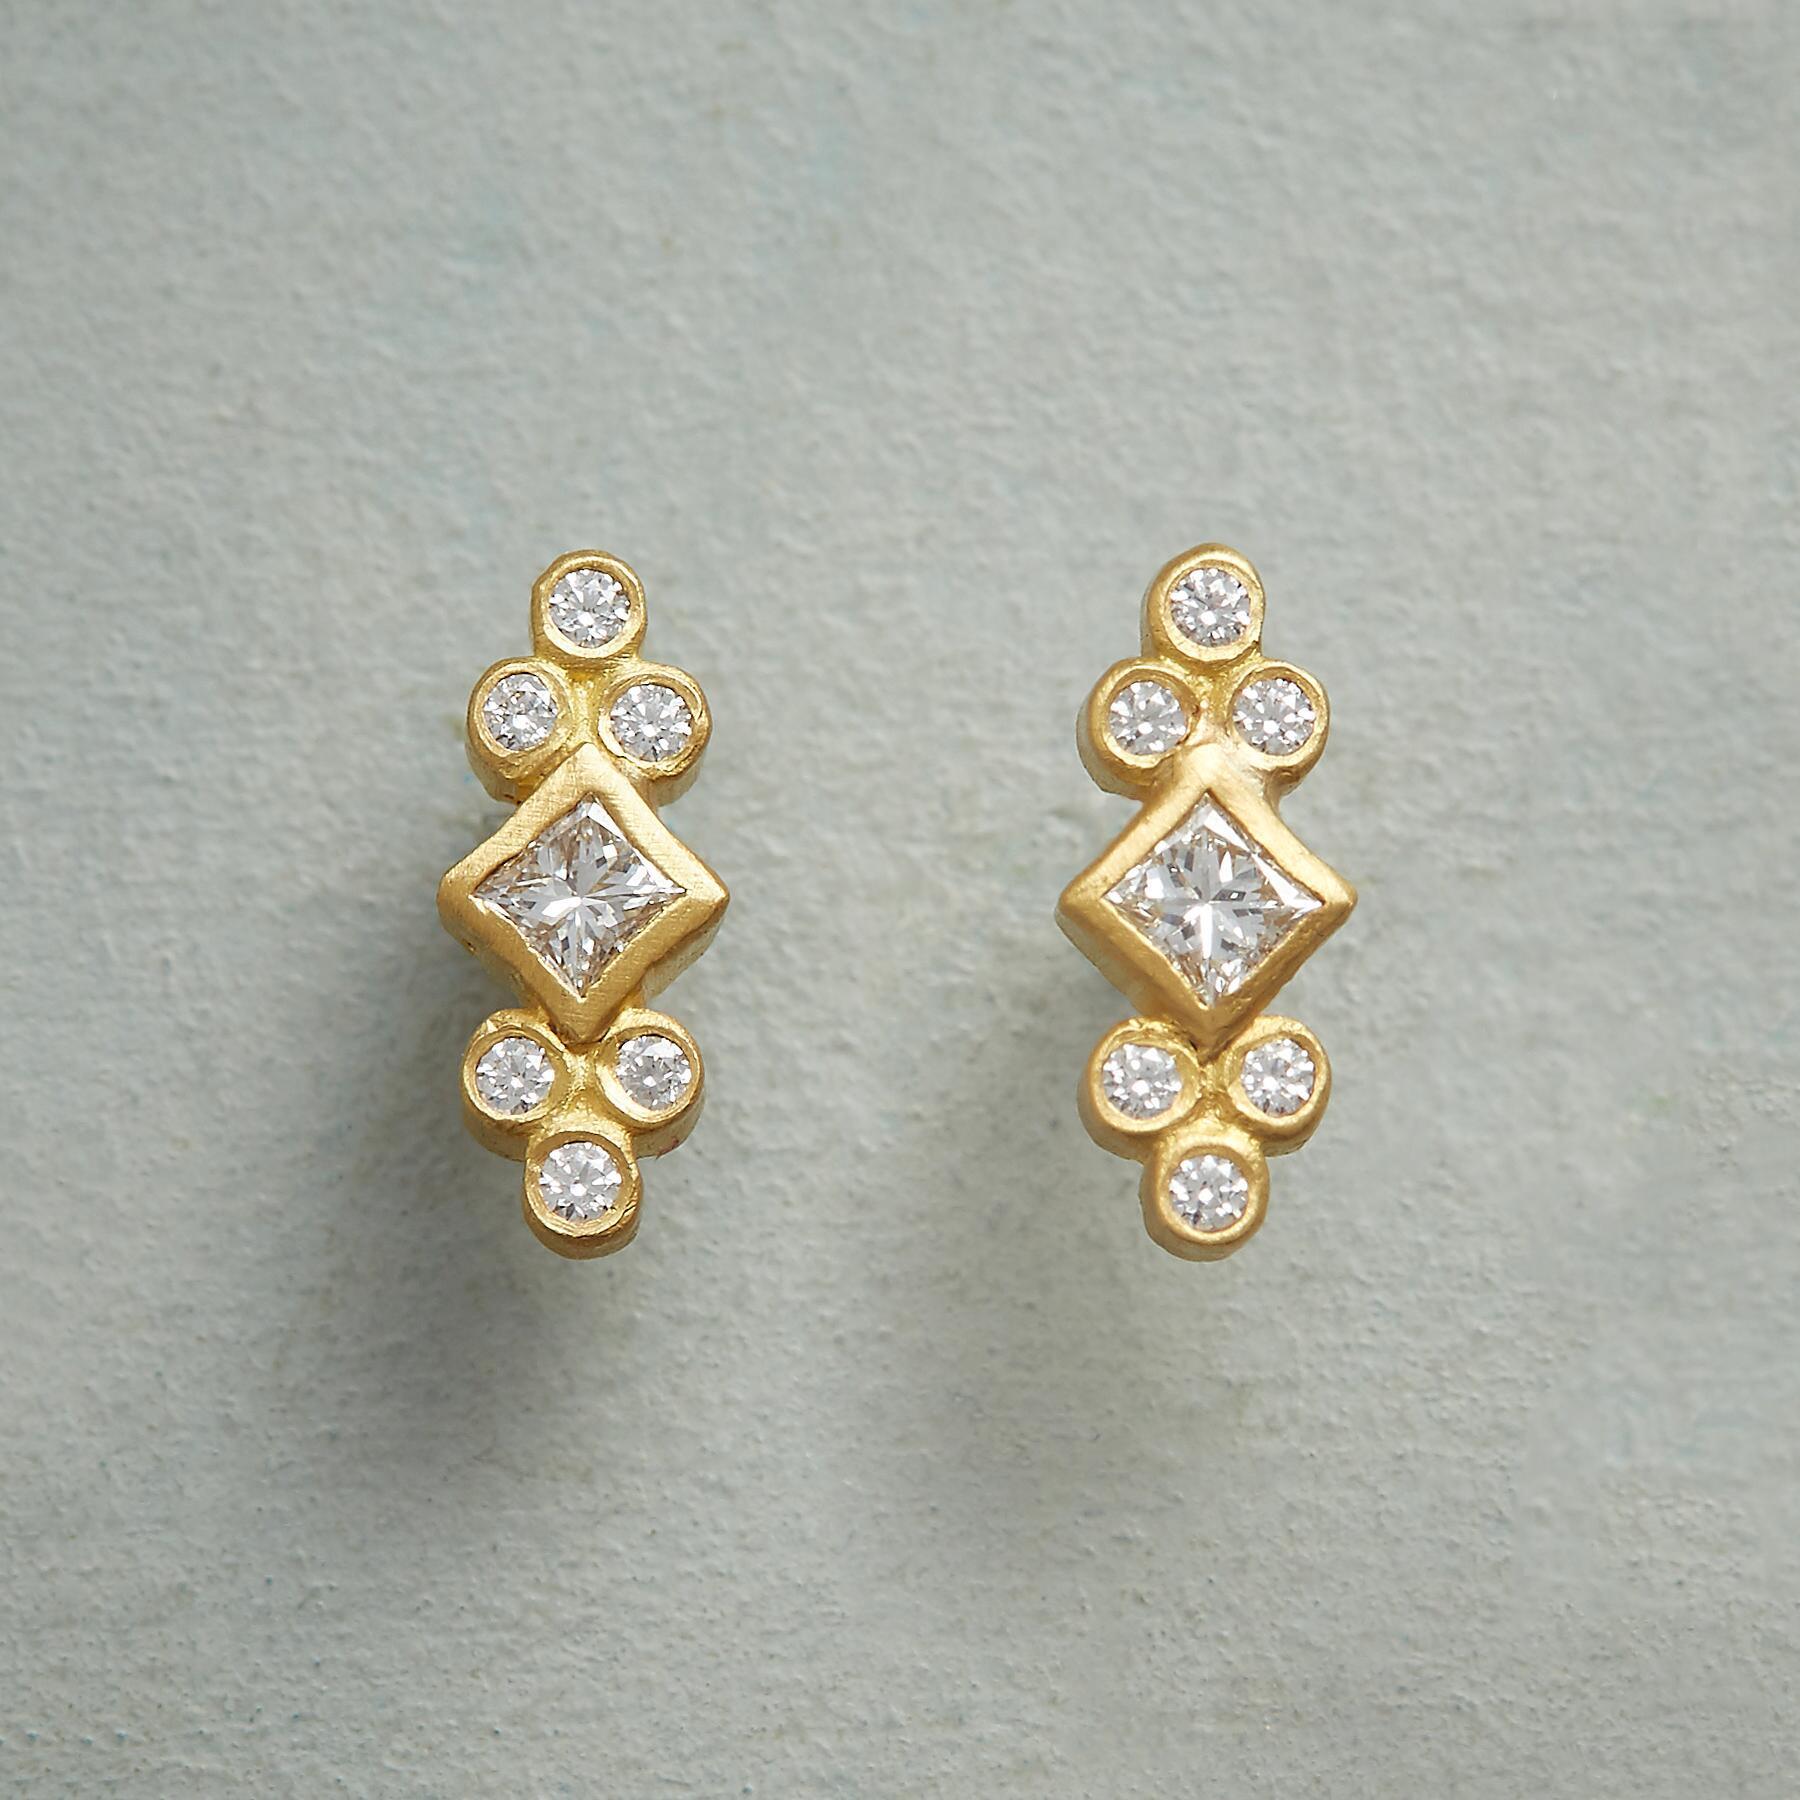 ROYAL DIAMOND EARRINGS: View 1